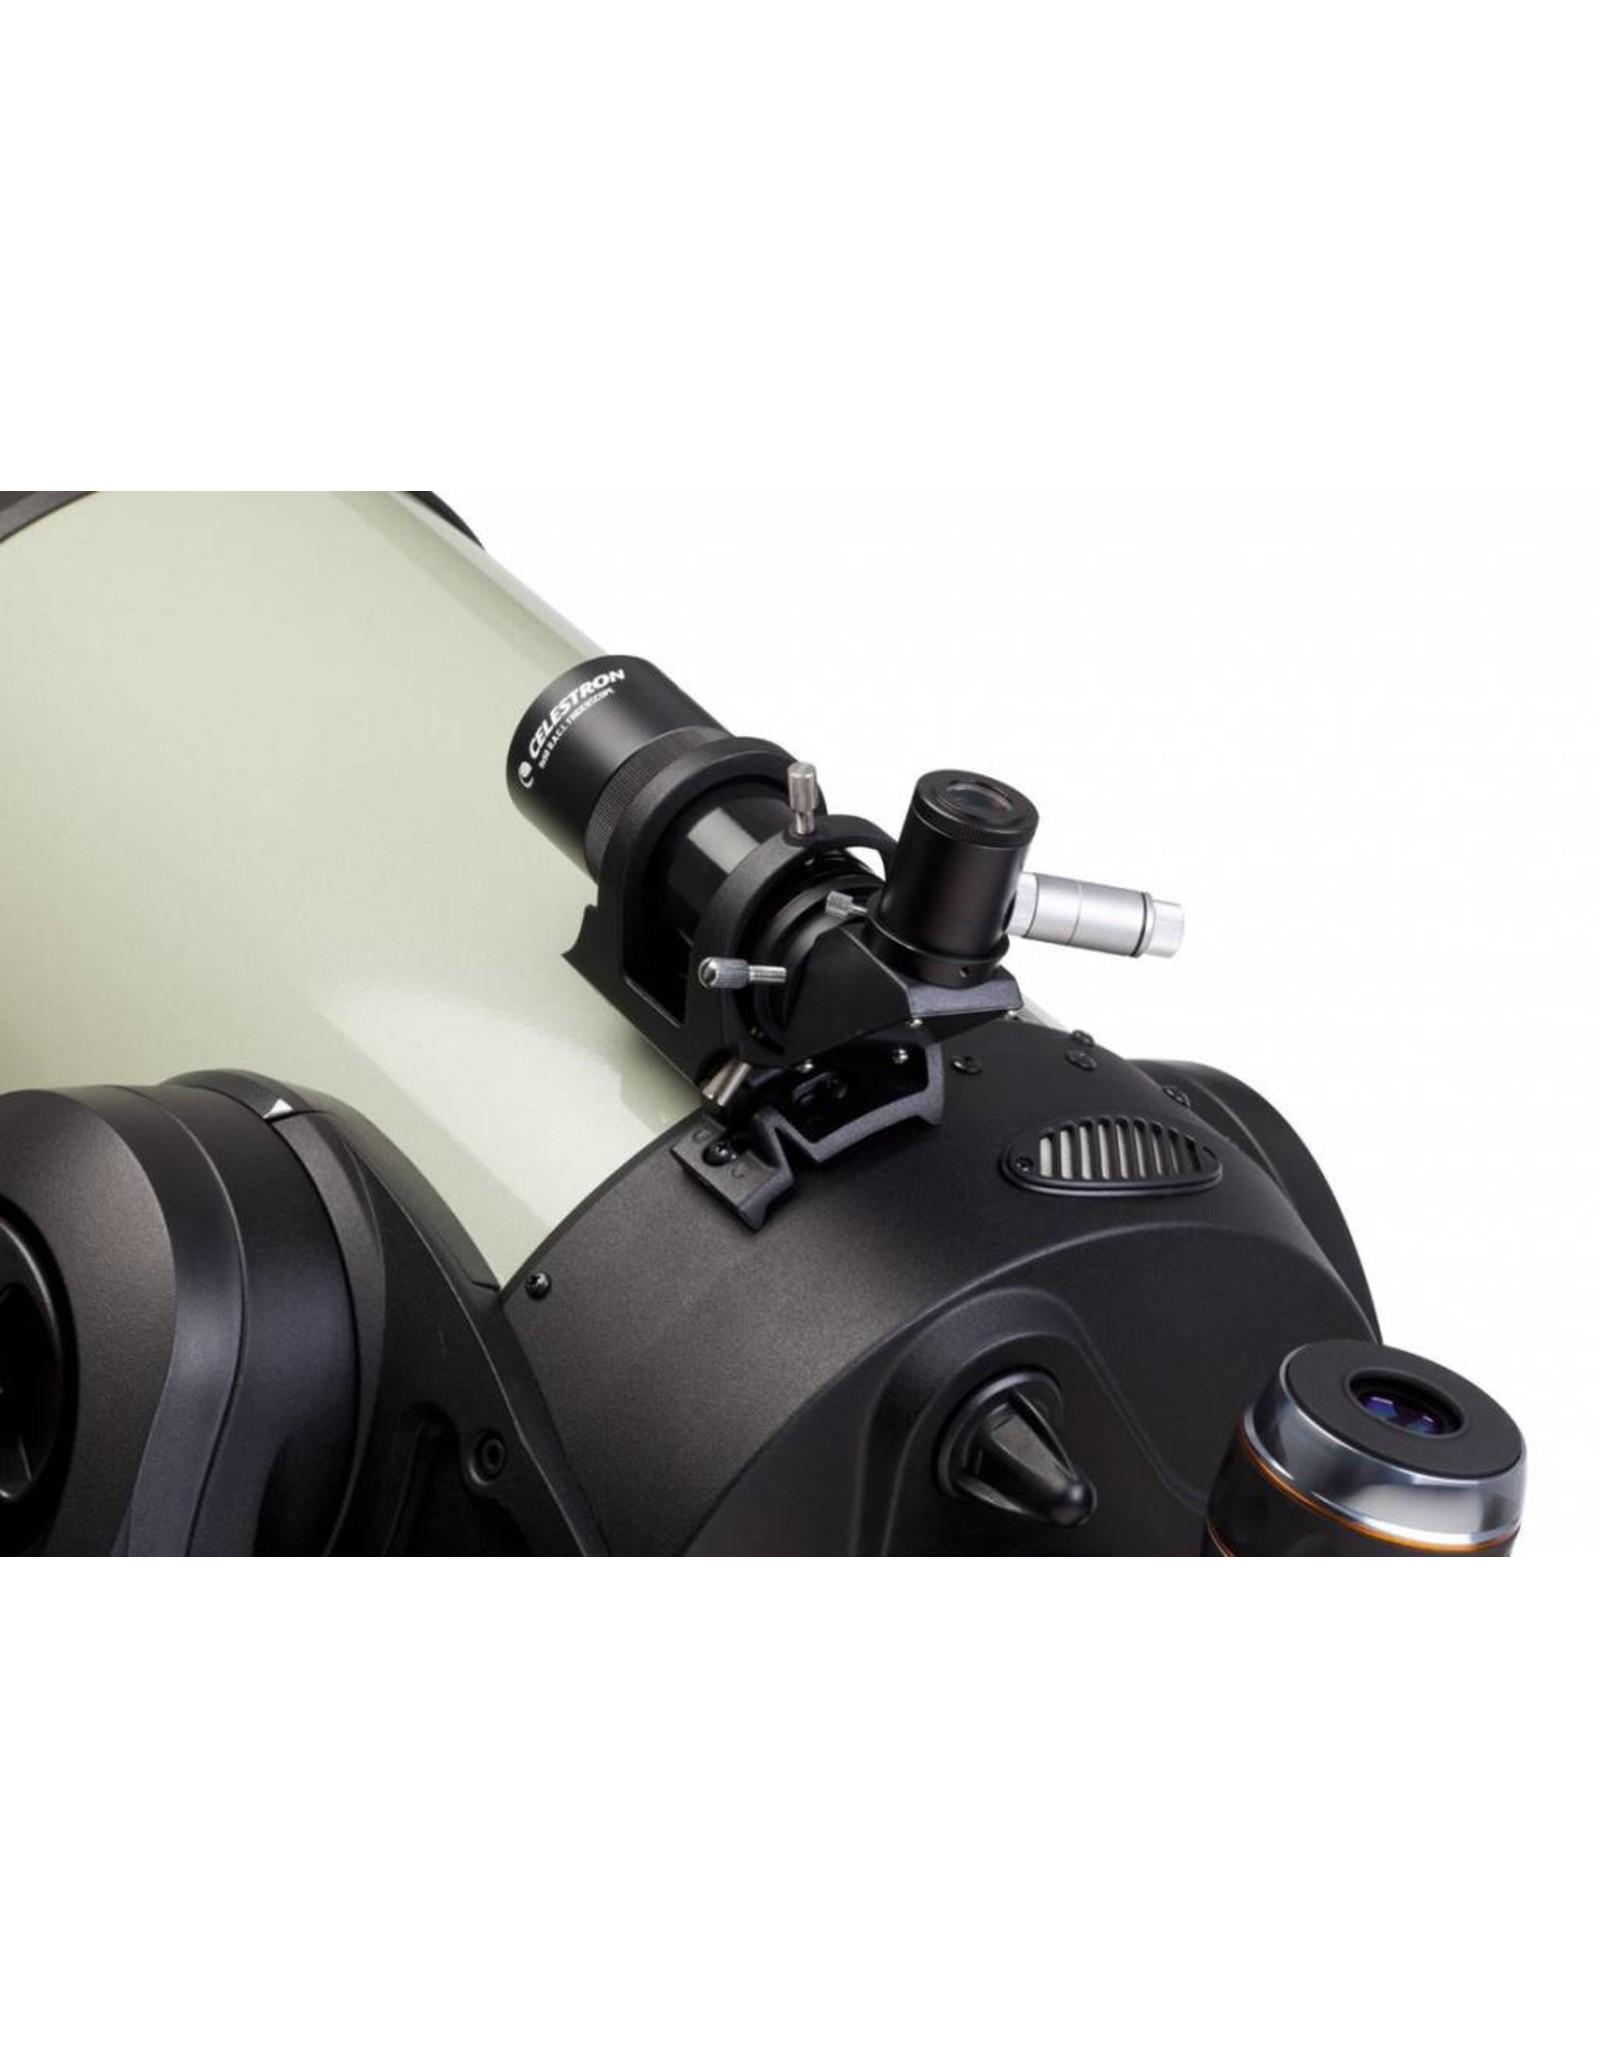 Celestron Celestron Illuminated Right Angle Correct Image Finderscope